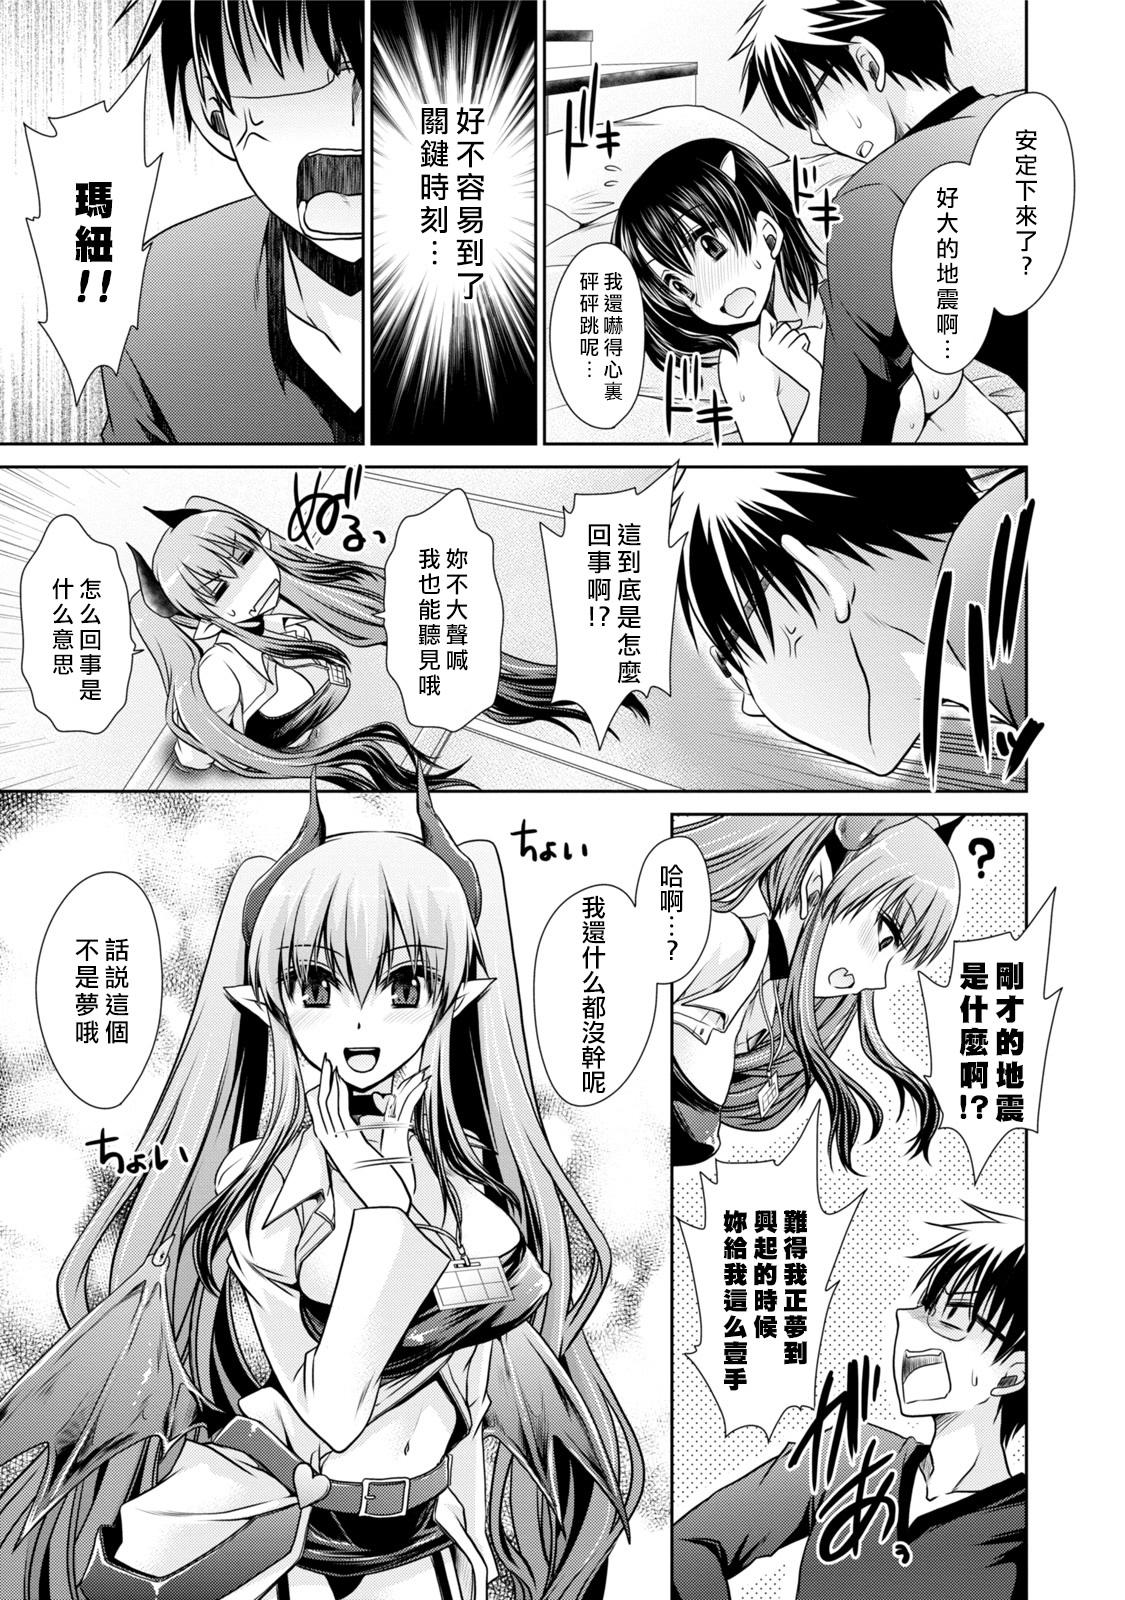 [Shinonome Ryu] Ore to Kanojo to Owaru Sekai - World's end LoveStory ch.1-9 [Chinese] [爱弹幕汉化组] [Digital] 106